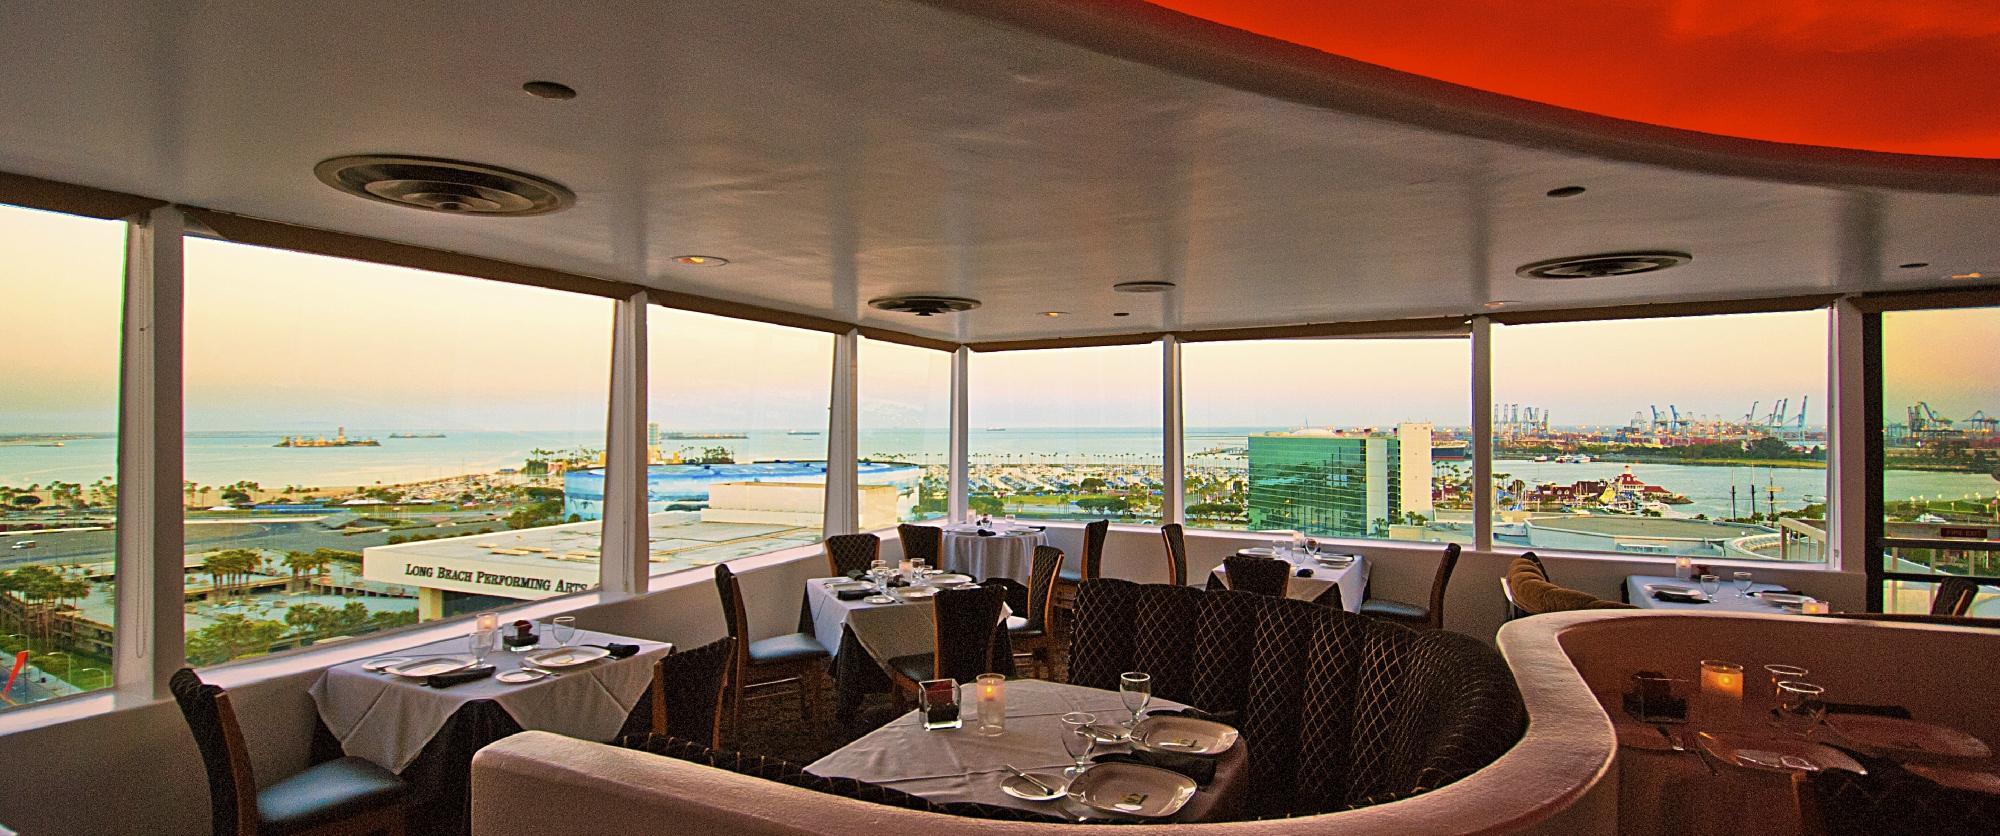 popular restaurants in long beach tripadvisor